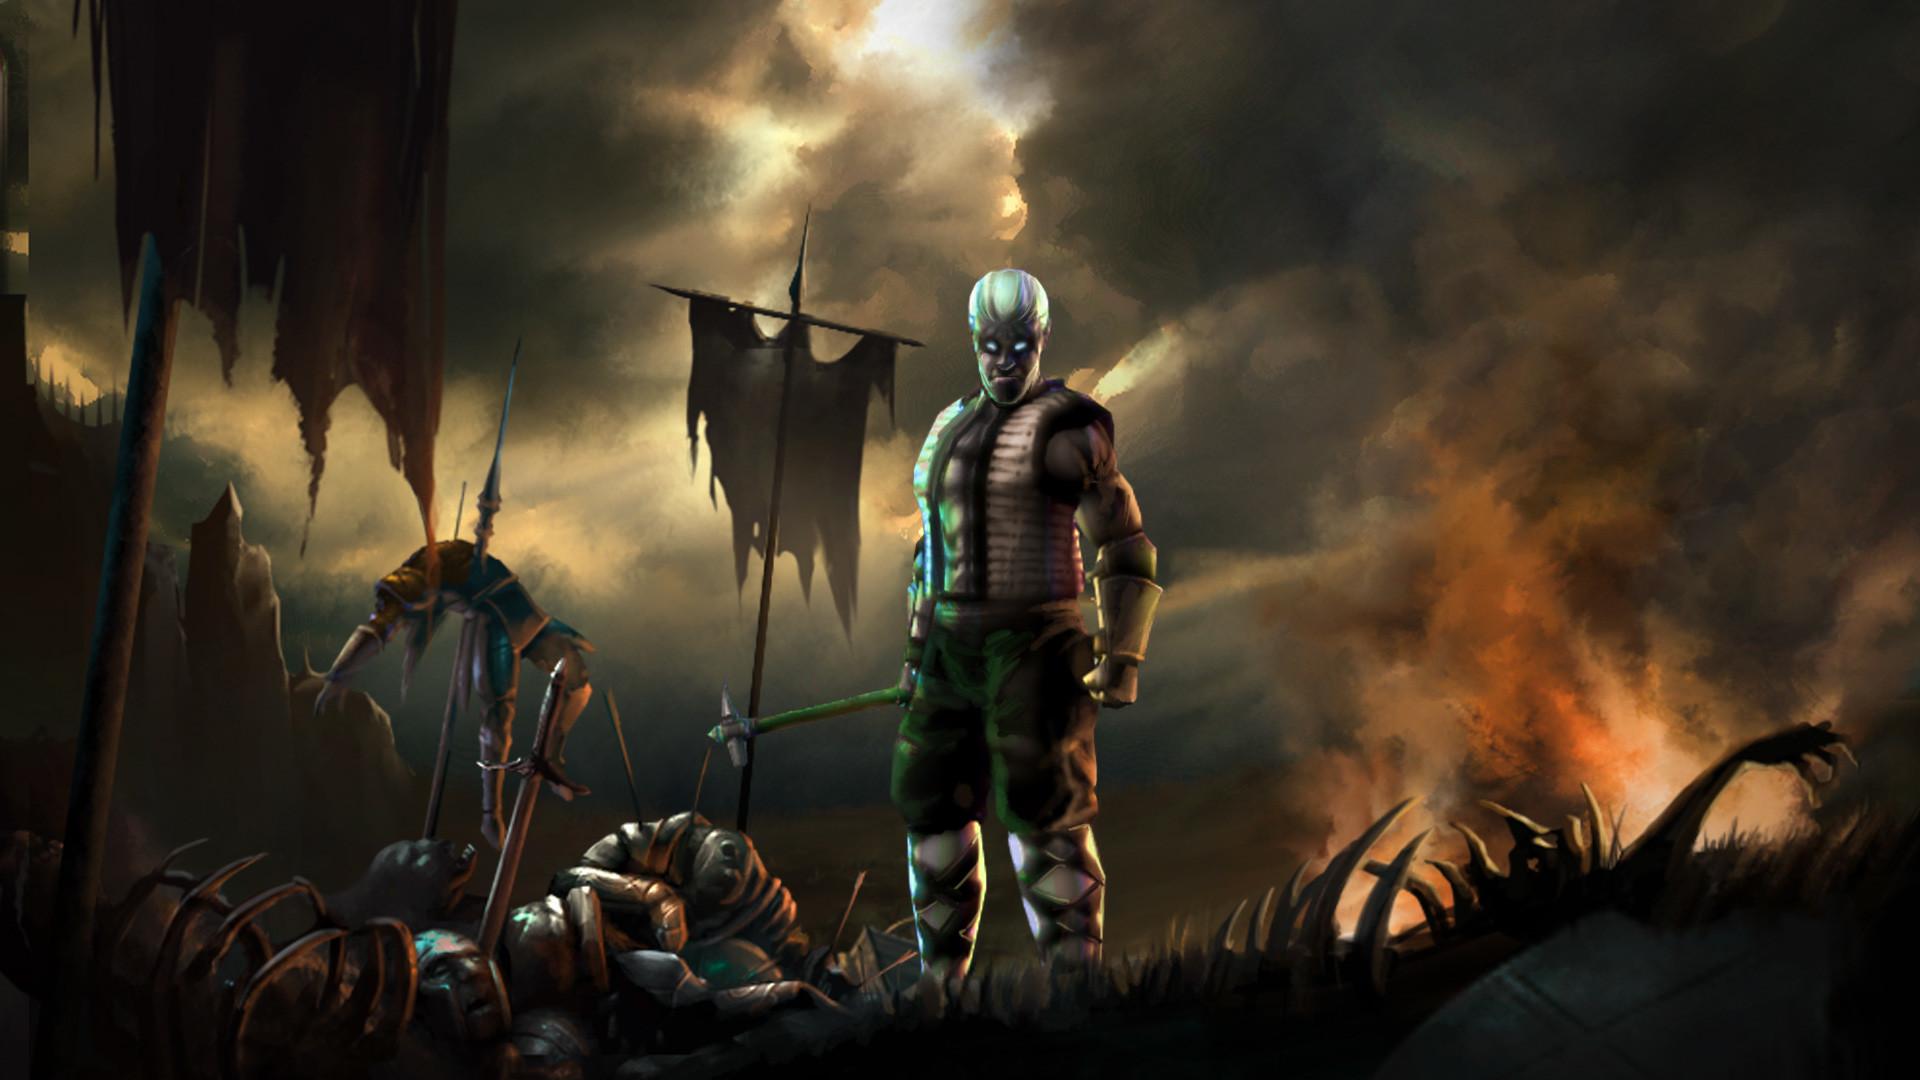 Res: 1920x1080, wallpaper #8 Wallpaper from Elemental: Fallen Enchantress - Legendary Heroes